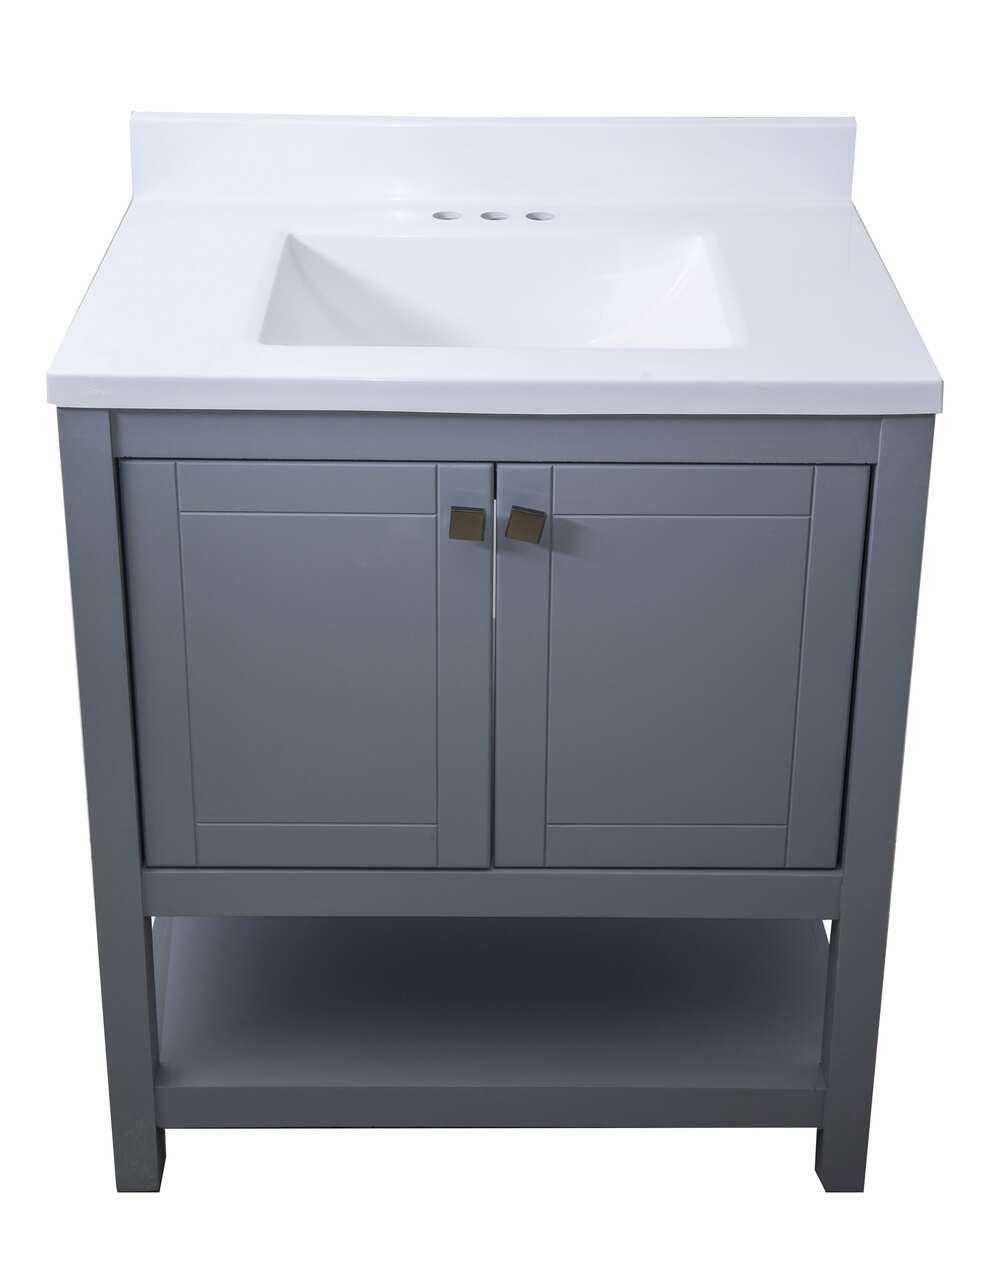 Trento 30 In Single Sink Bathroom Vanity In Grey